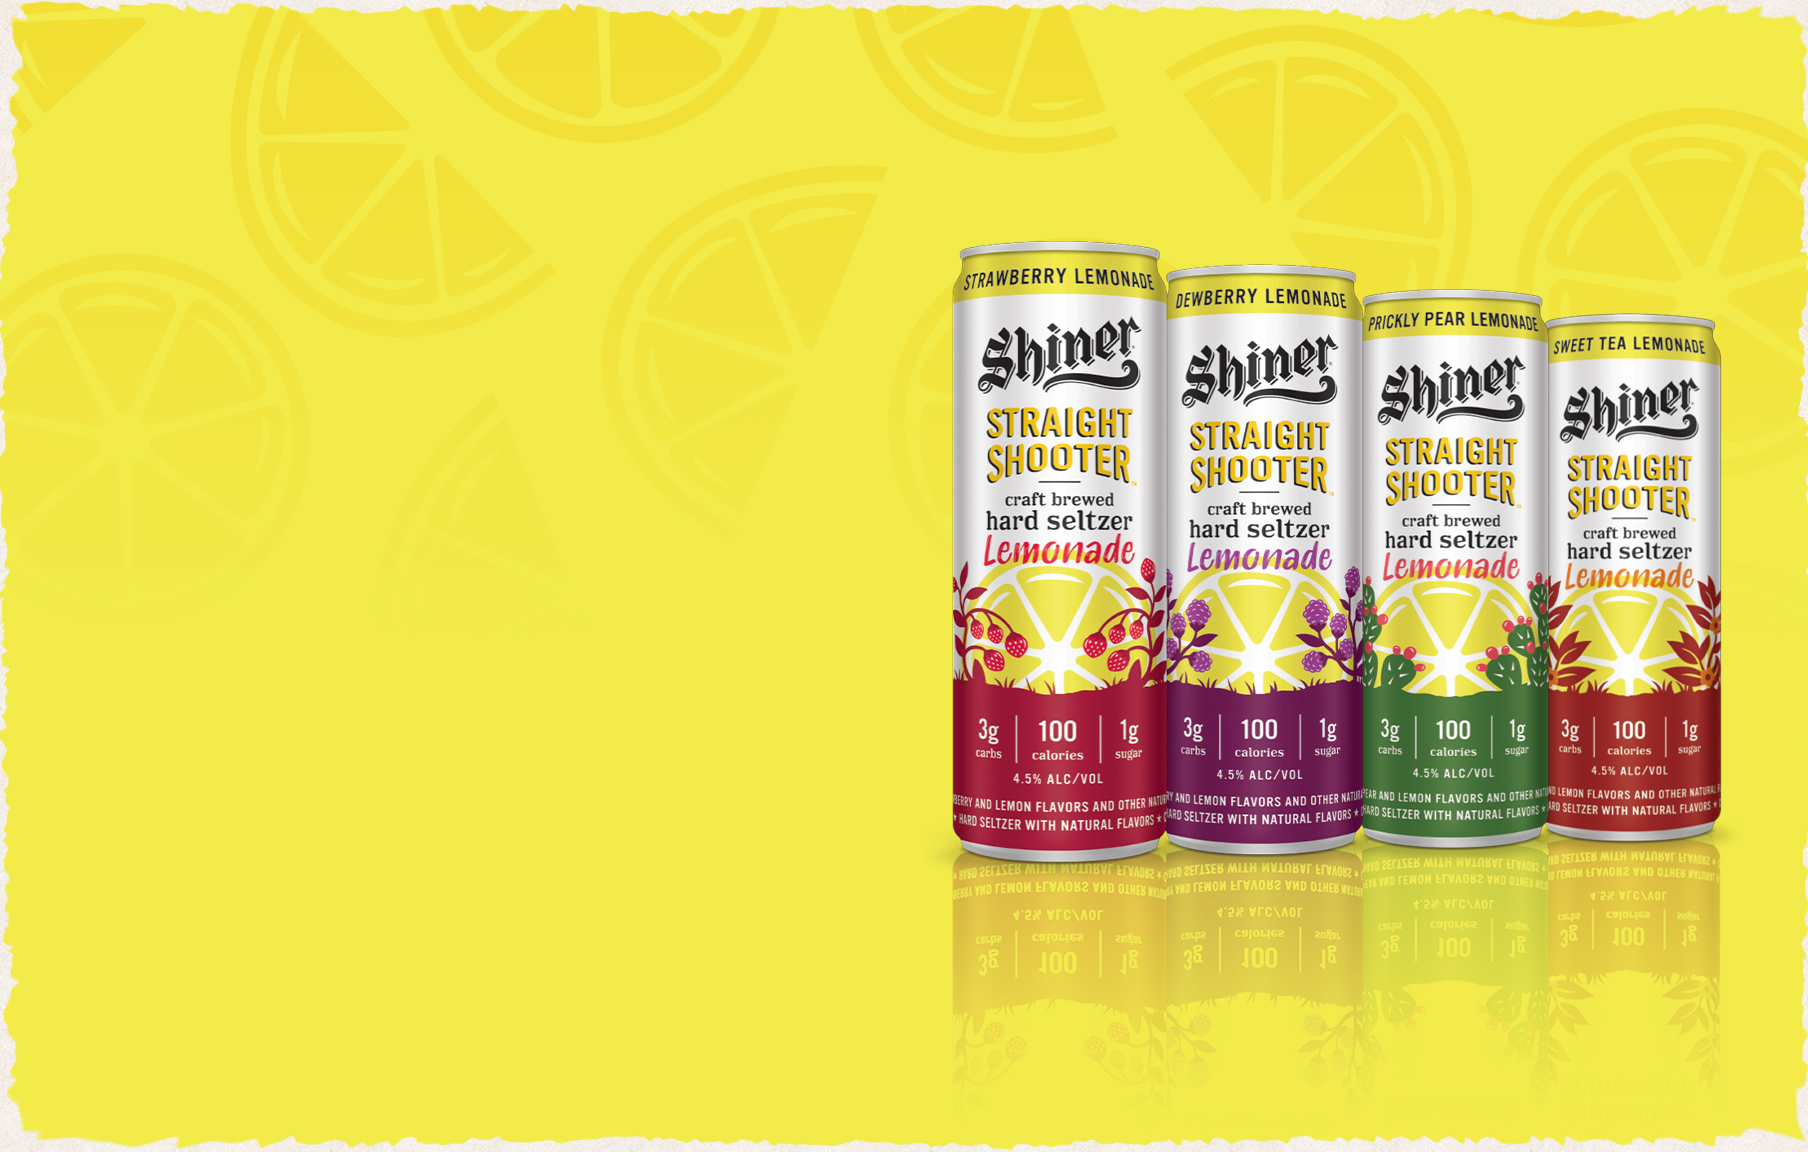 Variety Pack Lemonade